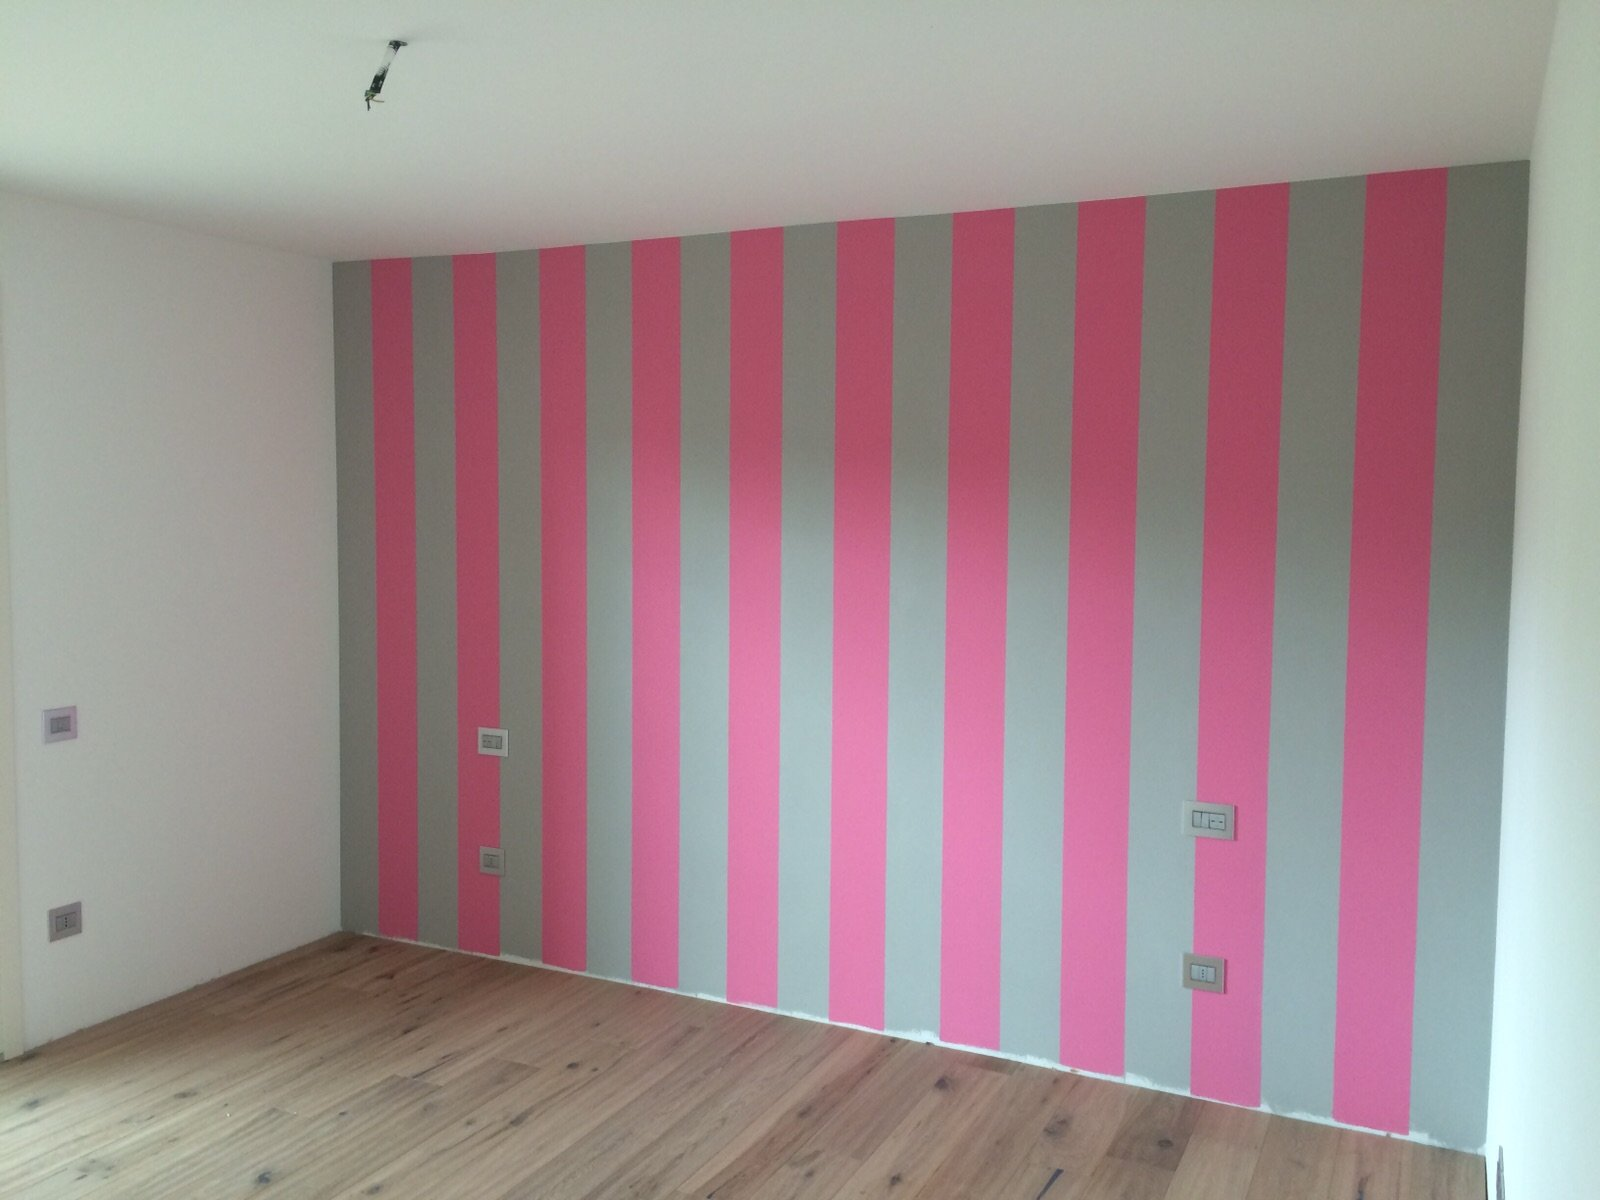 parete a righe grige e rosa